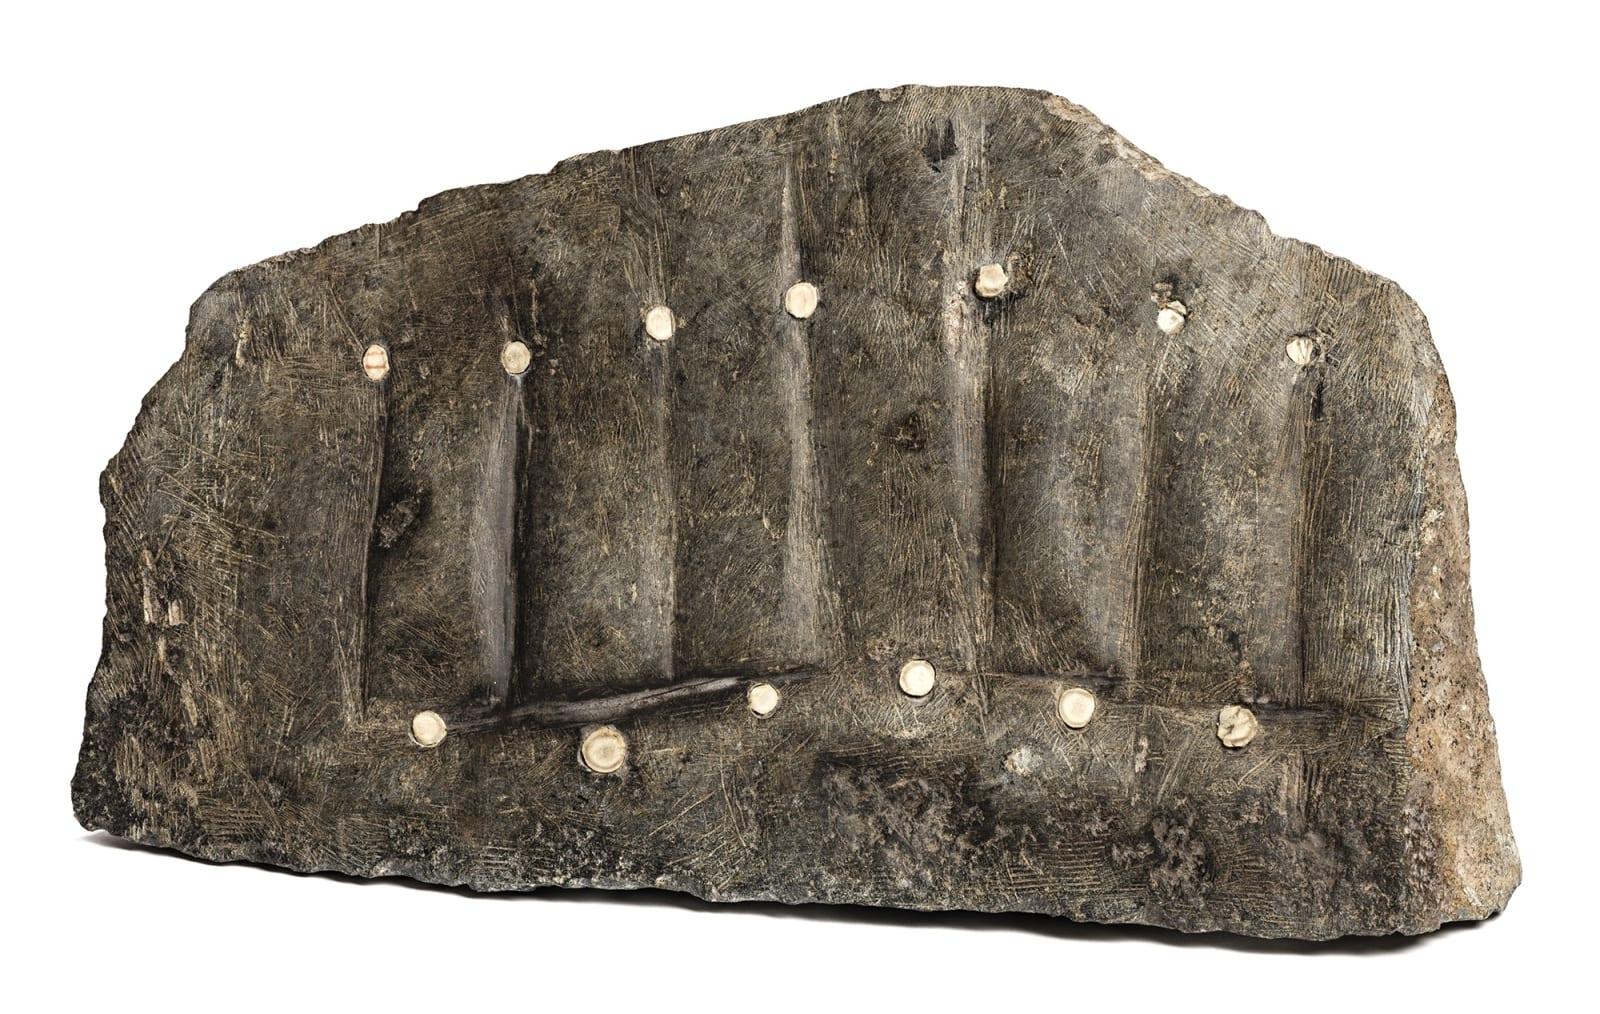 Lot 41 ELIZABETH NUTARAALUK AULATJUT (1914-1998) ARVIAT (ESKIMO POINT) Six Faces, late 1980s stone and antler, 12 x 21 x 5 in (30.5 x 53.3 x 12.7 cm) Estimate: $10,000 — $15,000